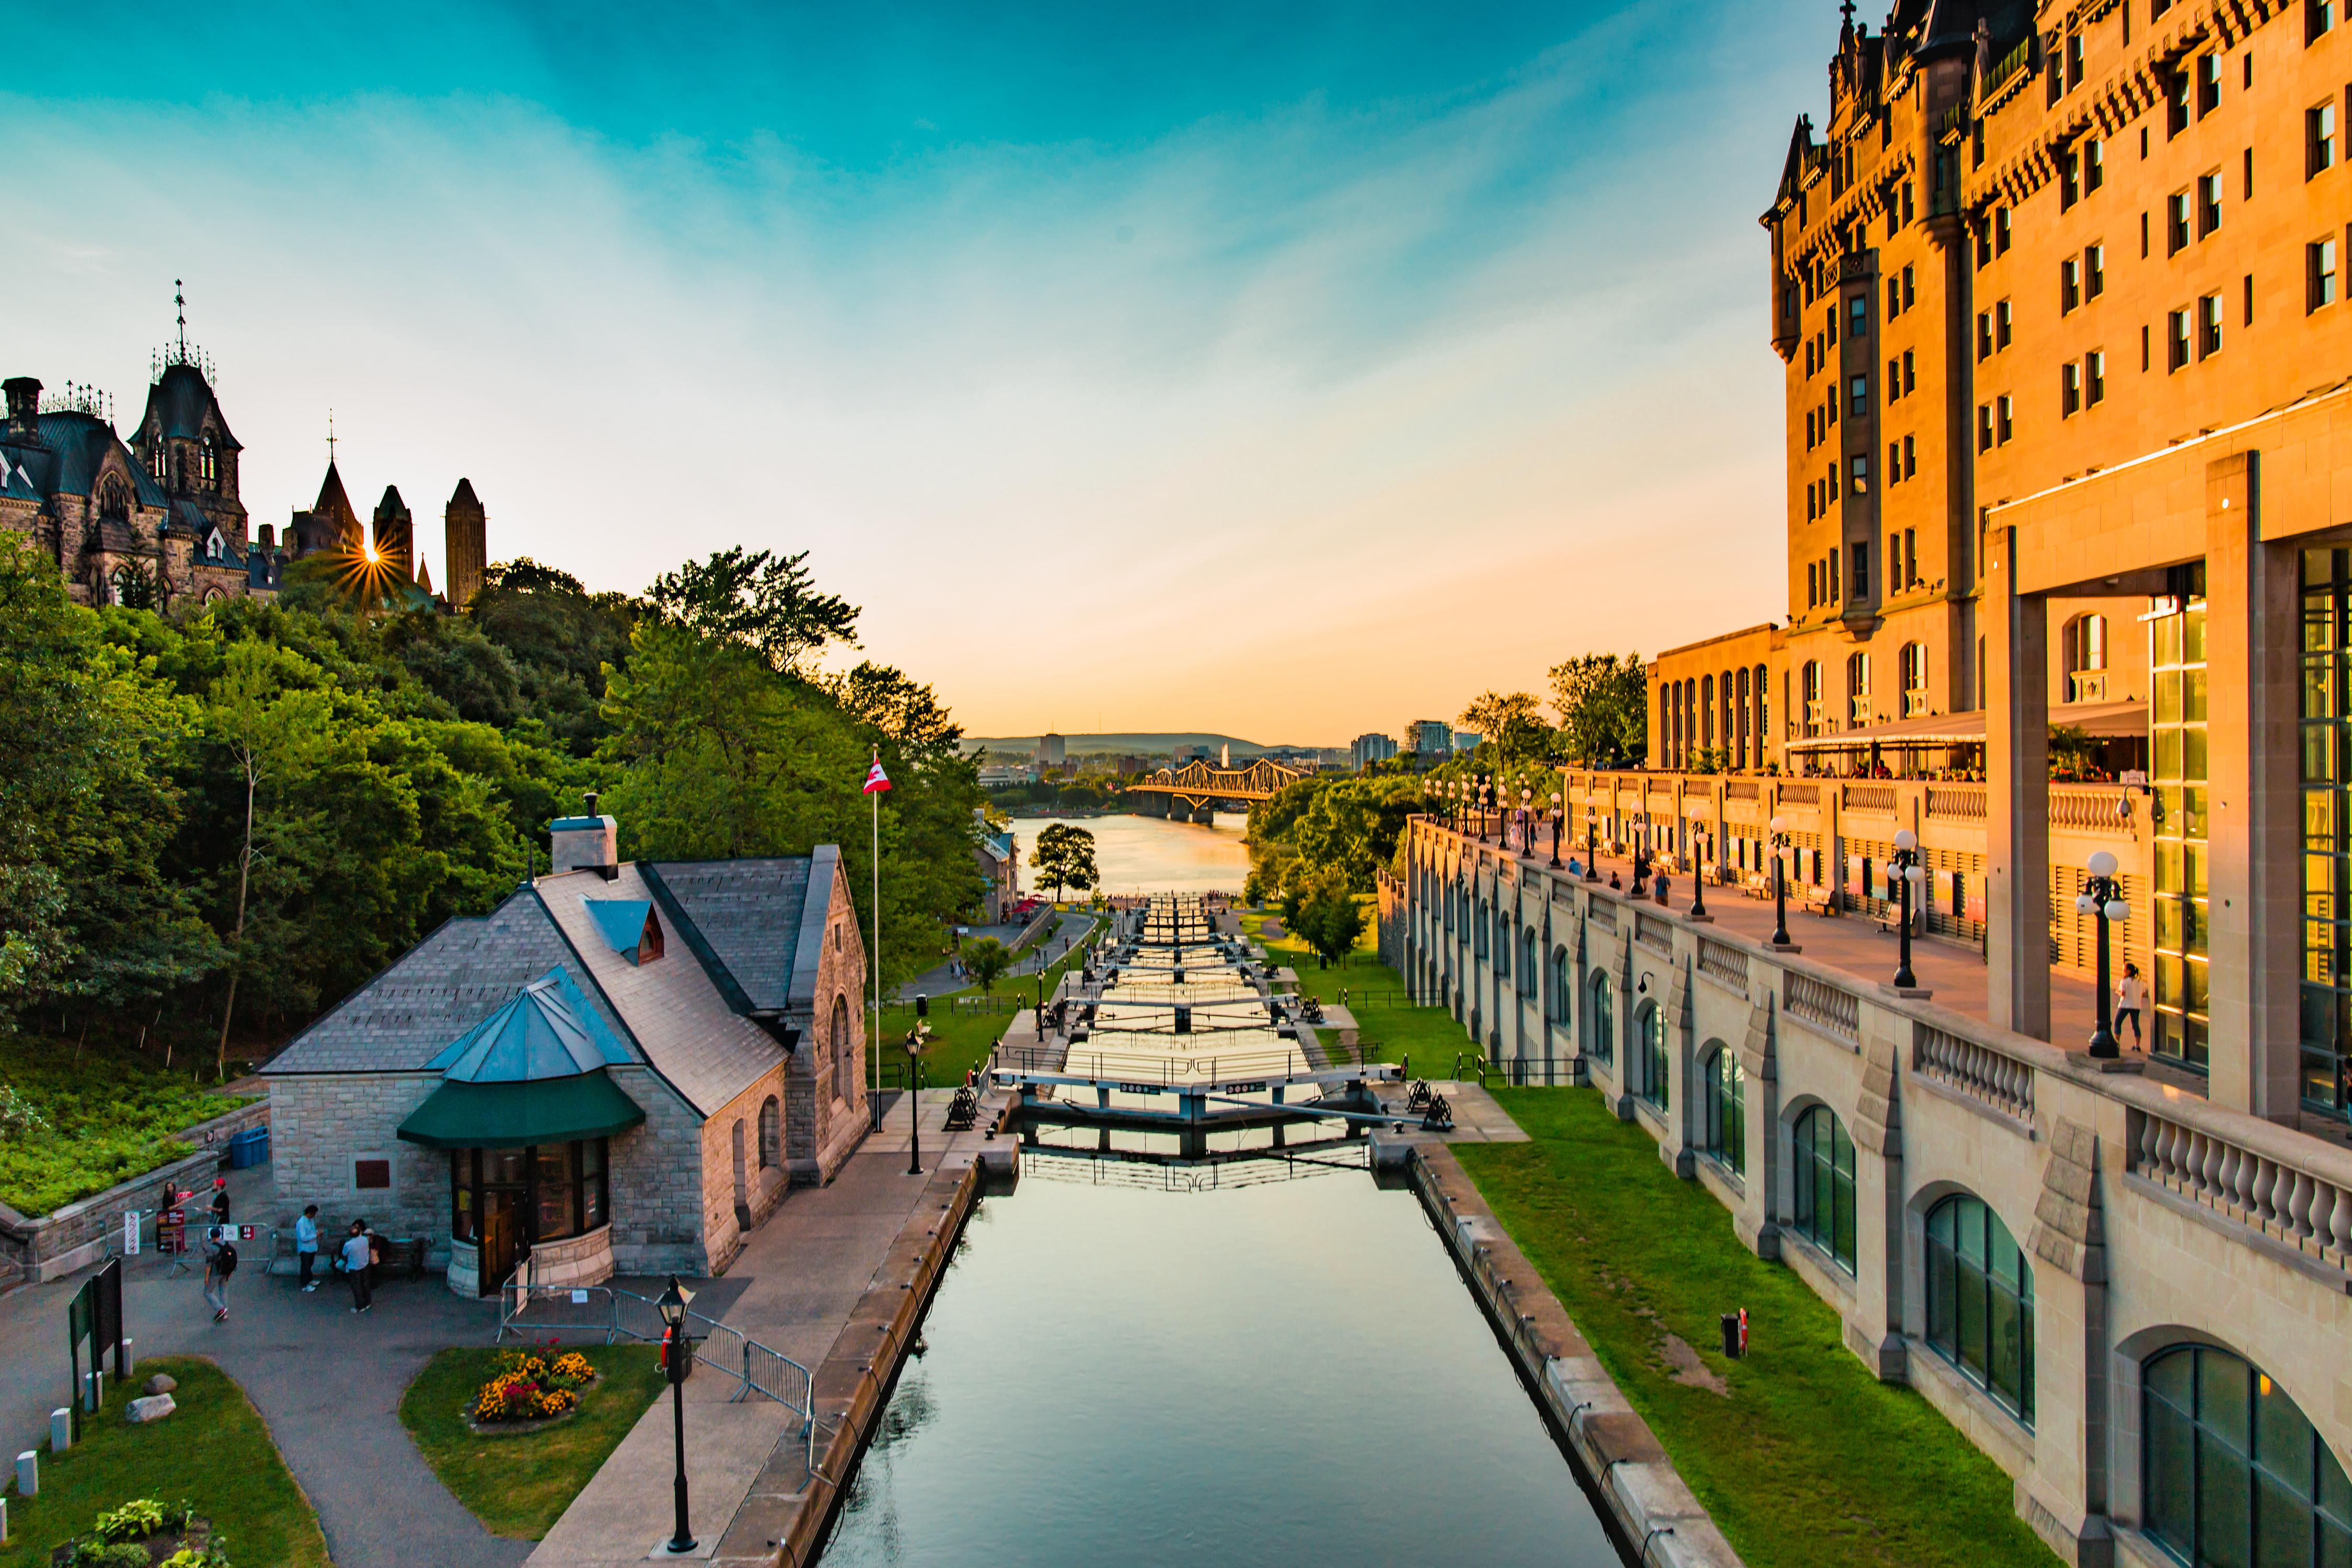 4-Day Canada, Montreal, Ottawa, Toronto & Niagara Falls Bus Tour from New York